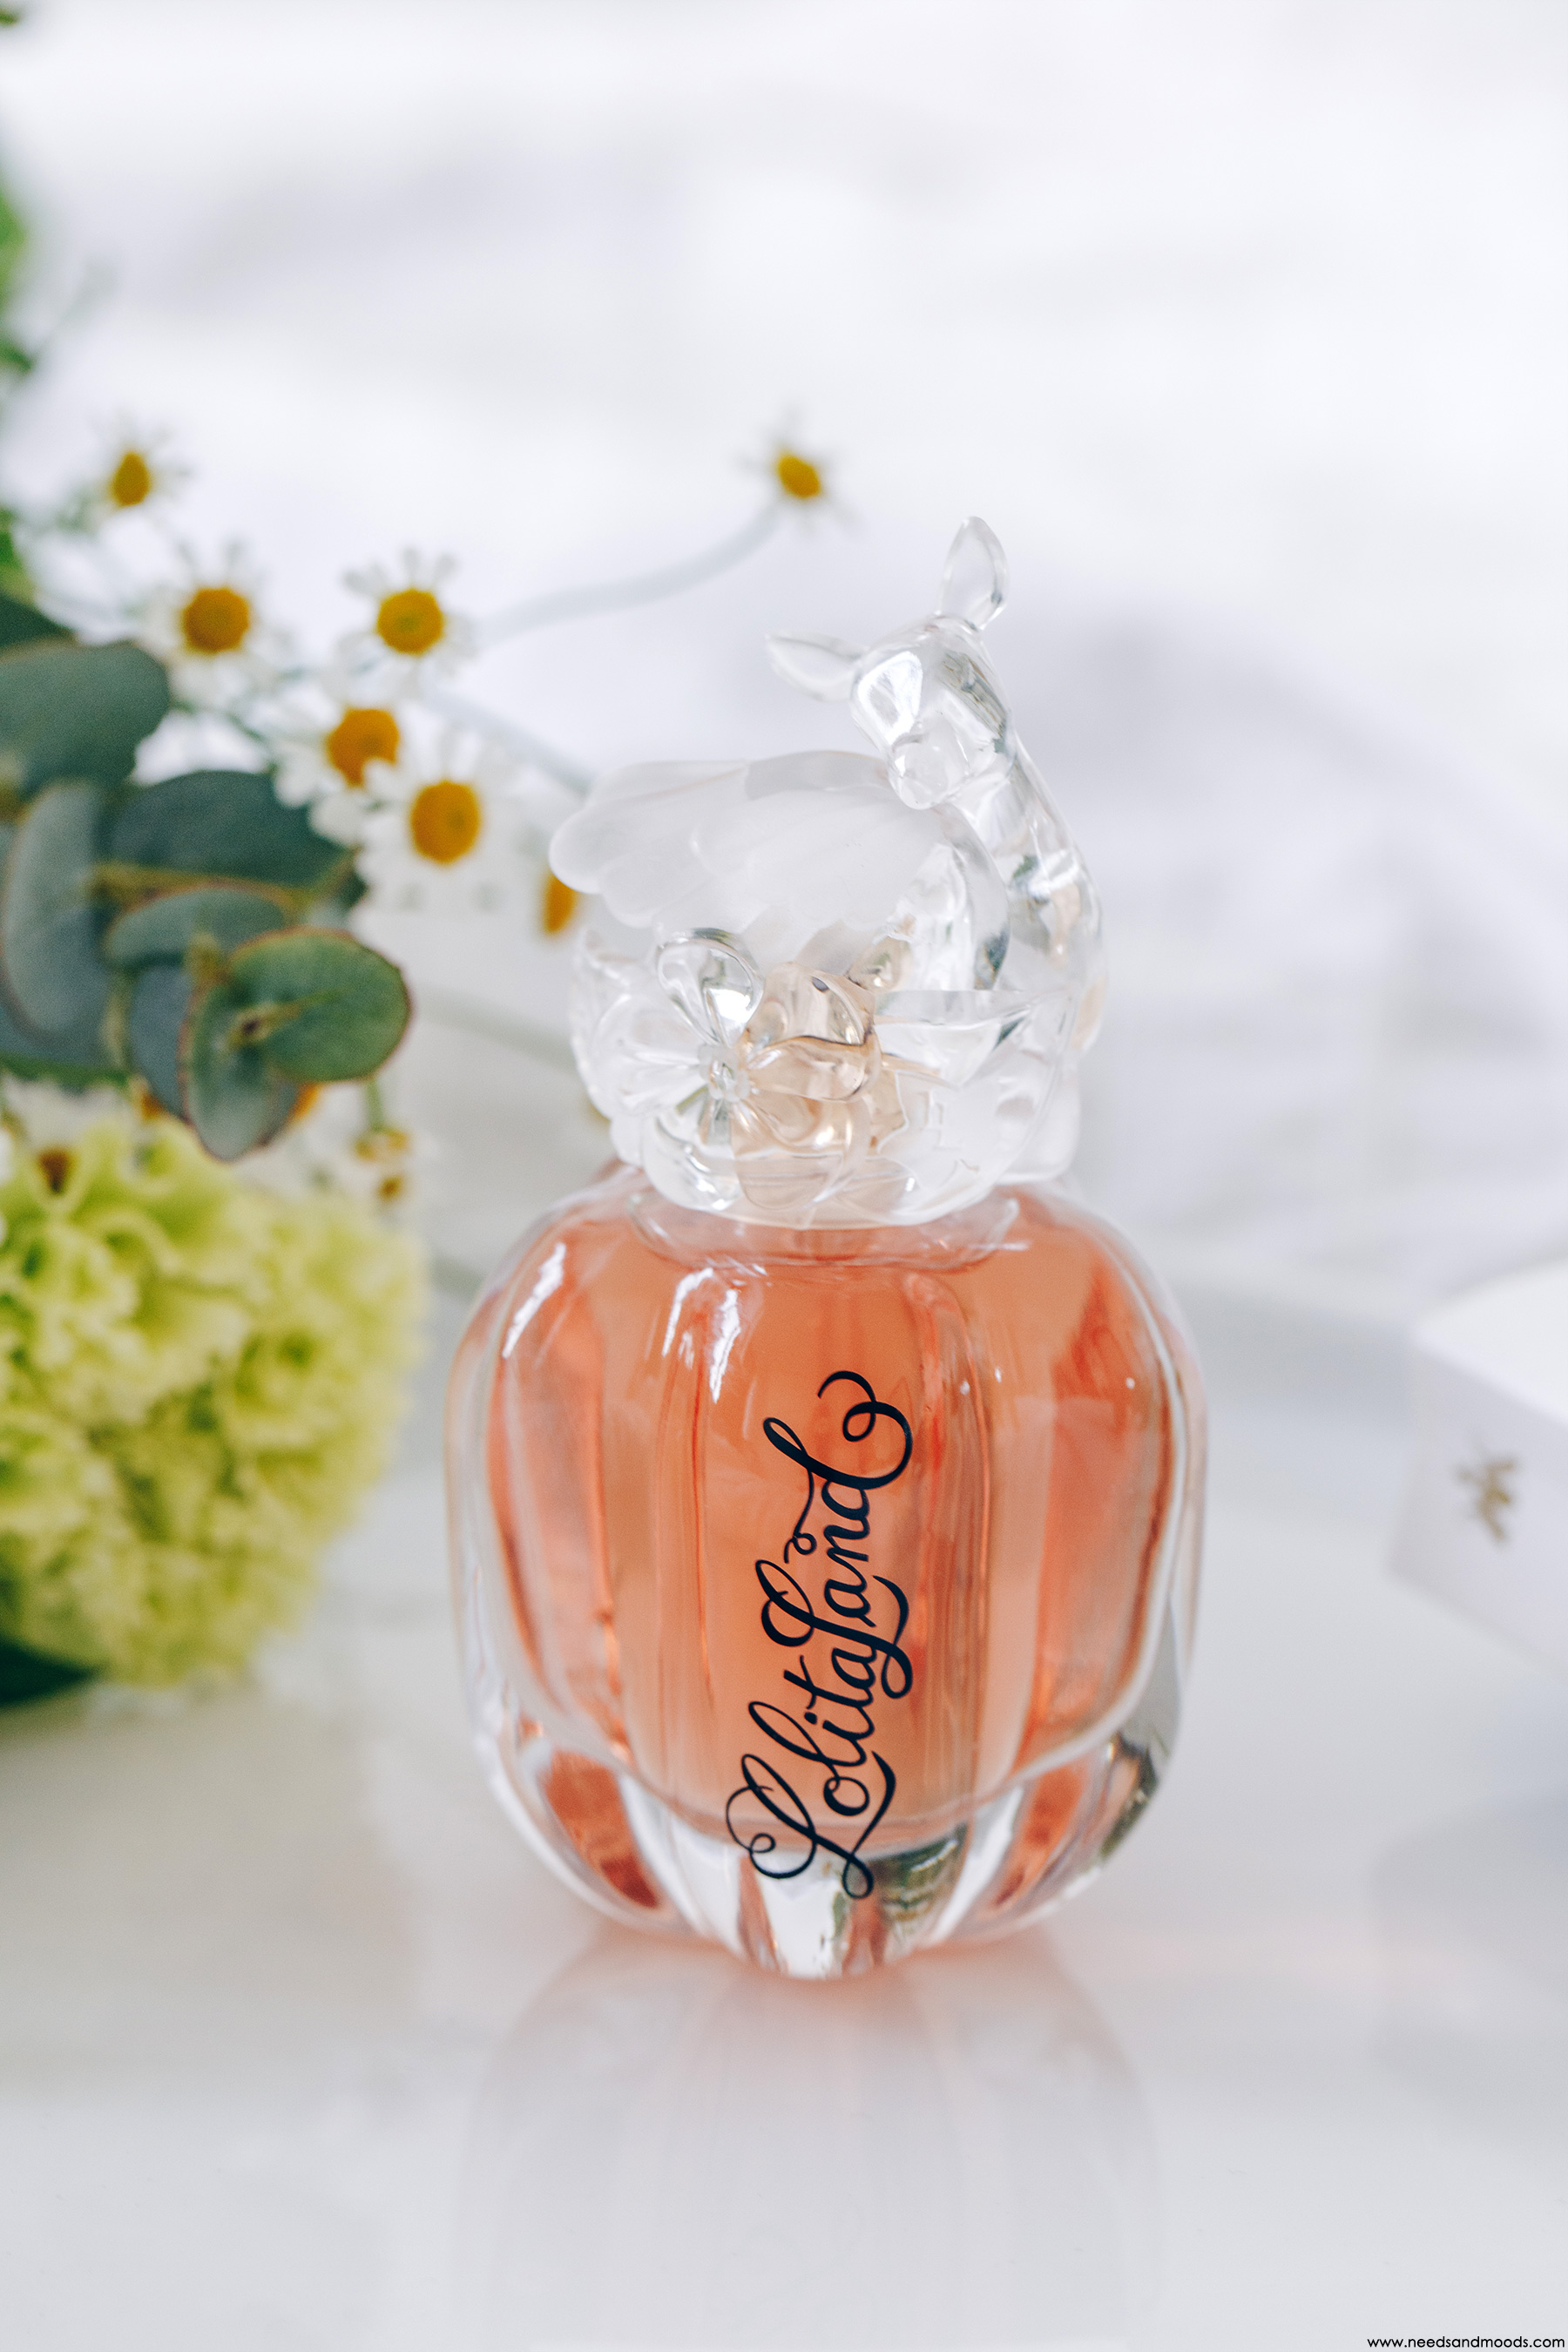 lolita lempicka lolitaland eau parfum